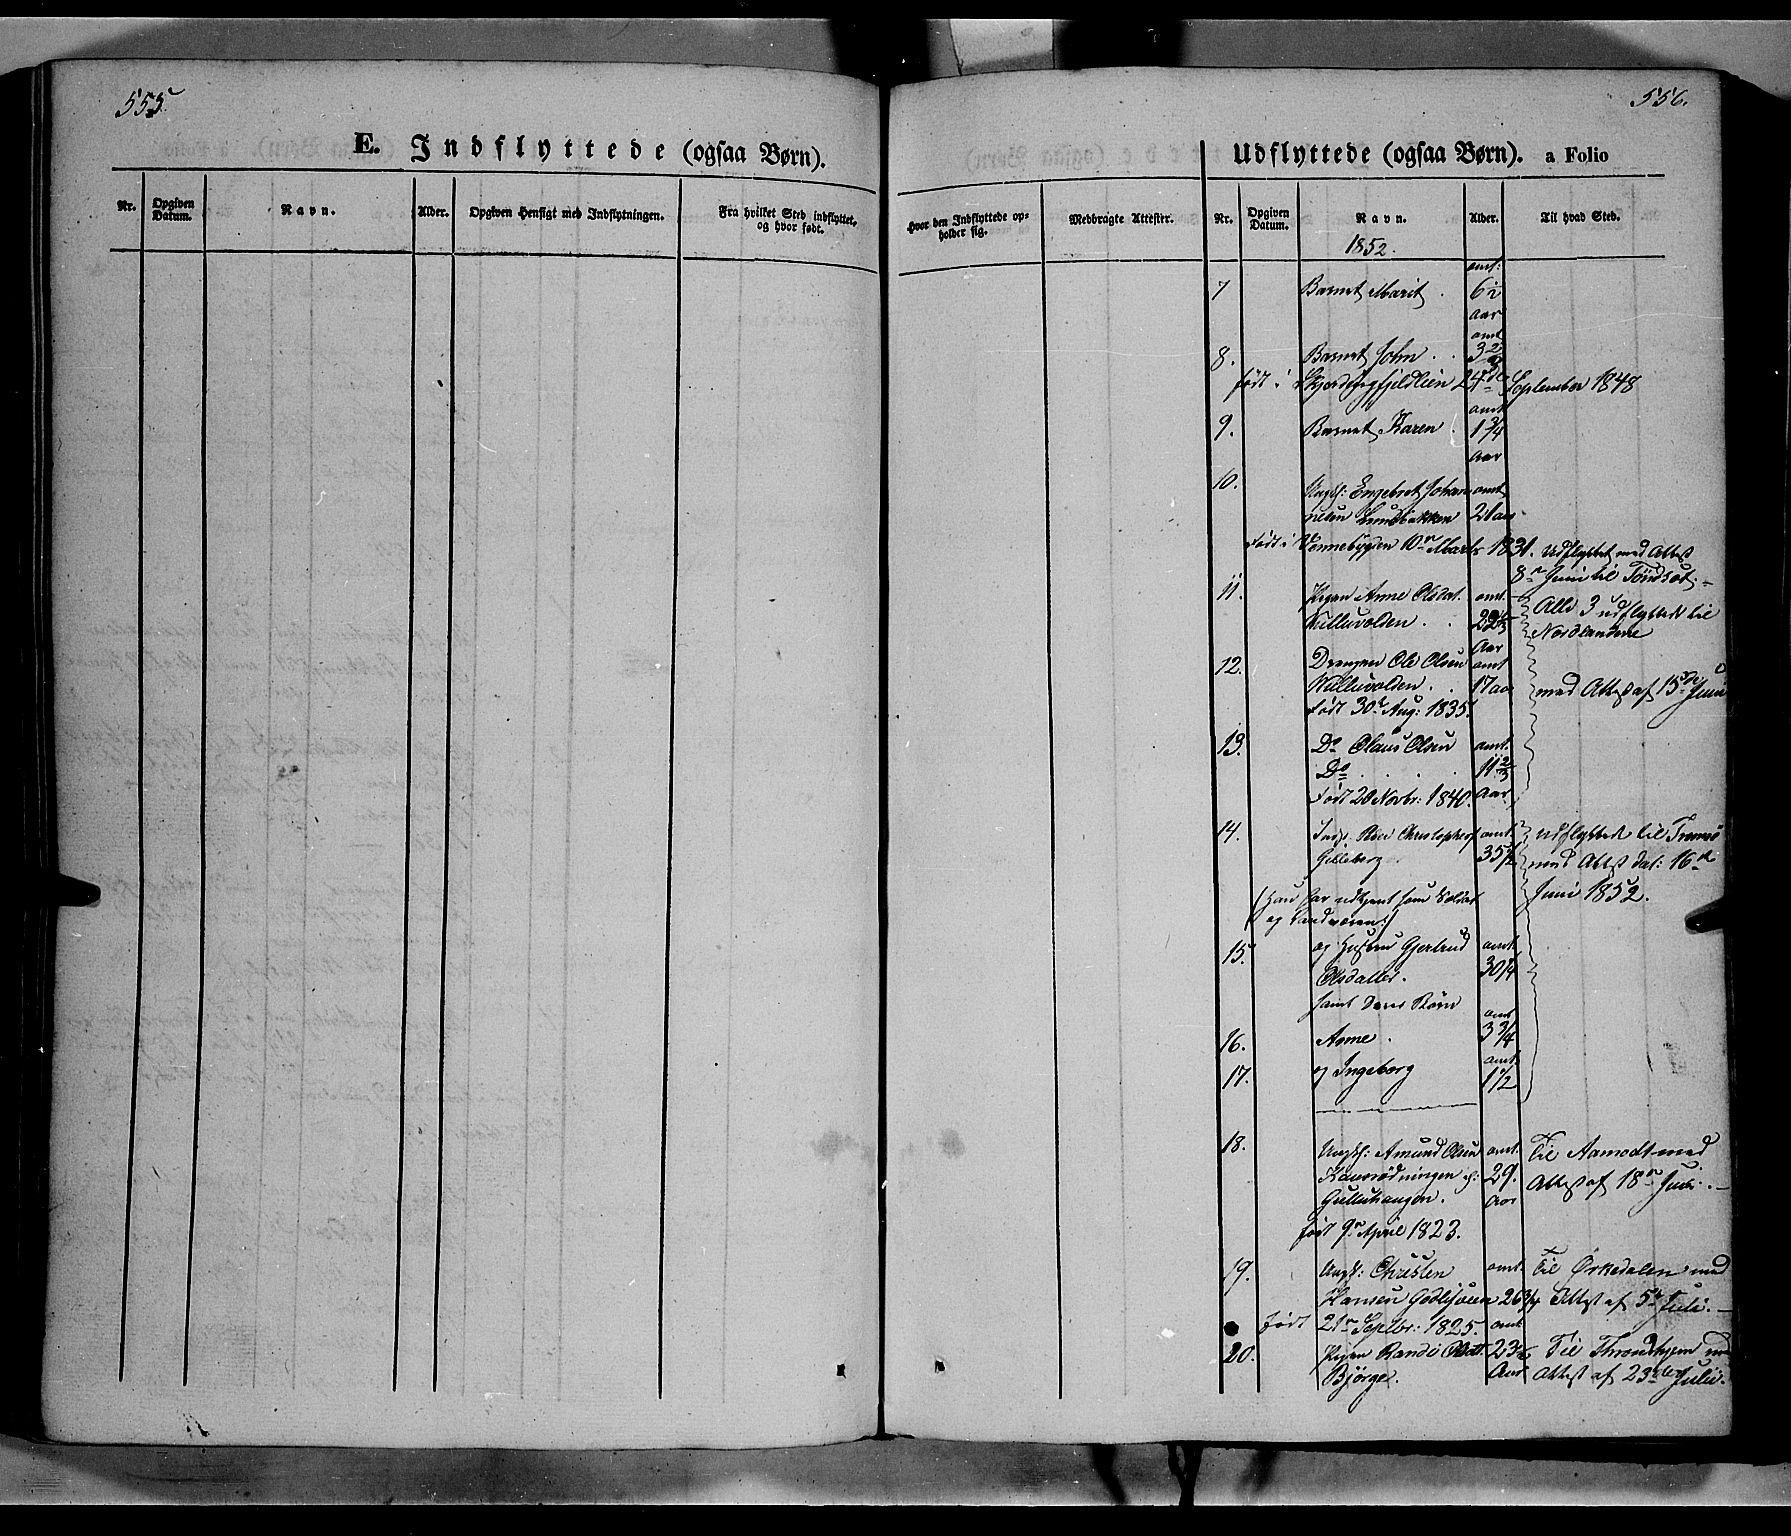 SAH, Ringebu prestekontor, Ministerialbok nr. 6, 1848-1859, s. 555-556